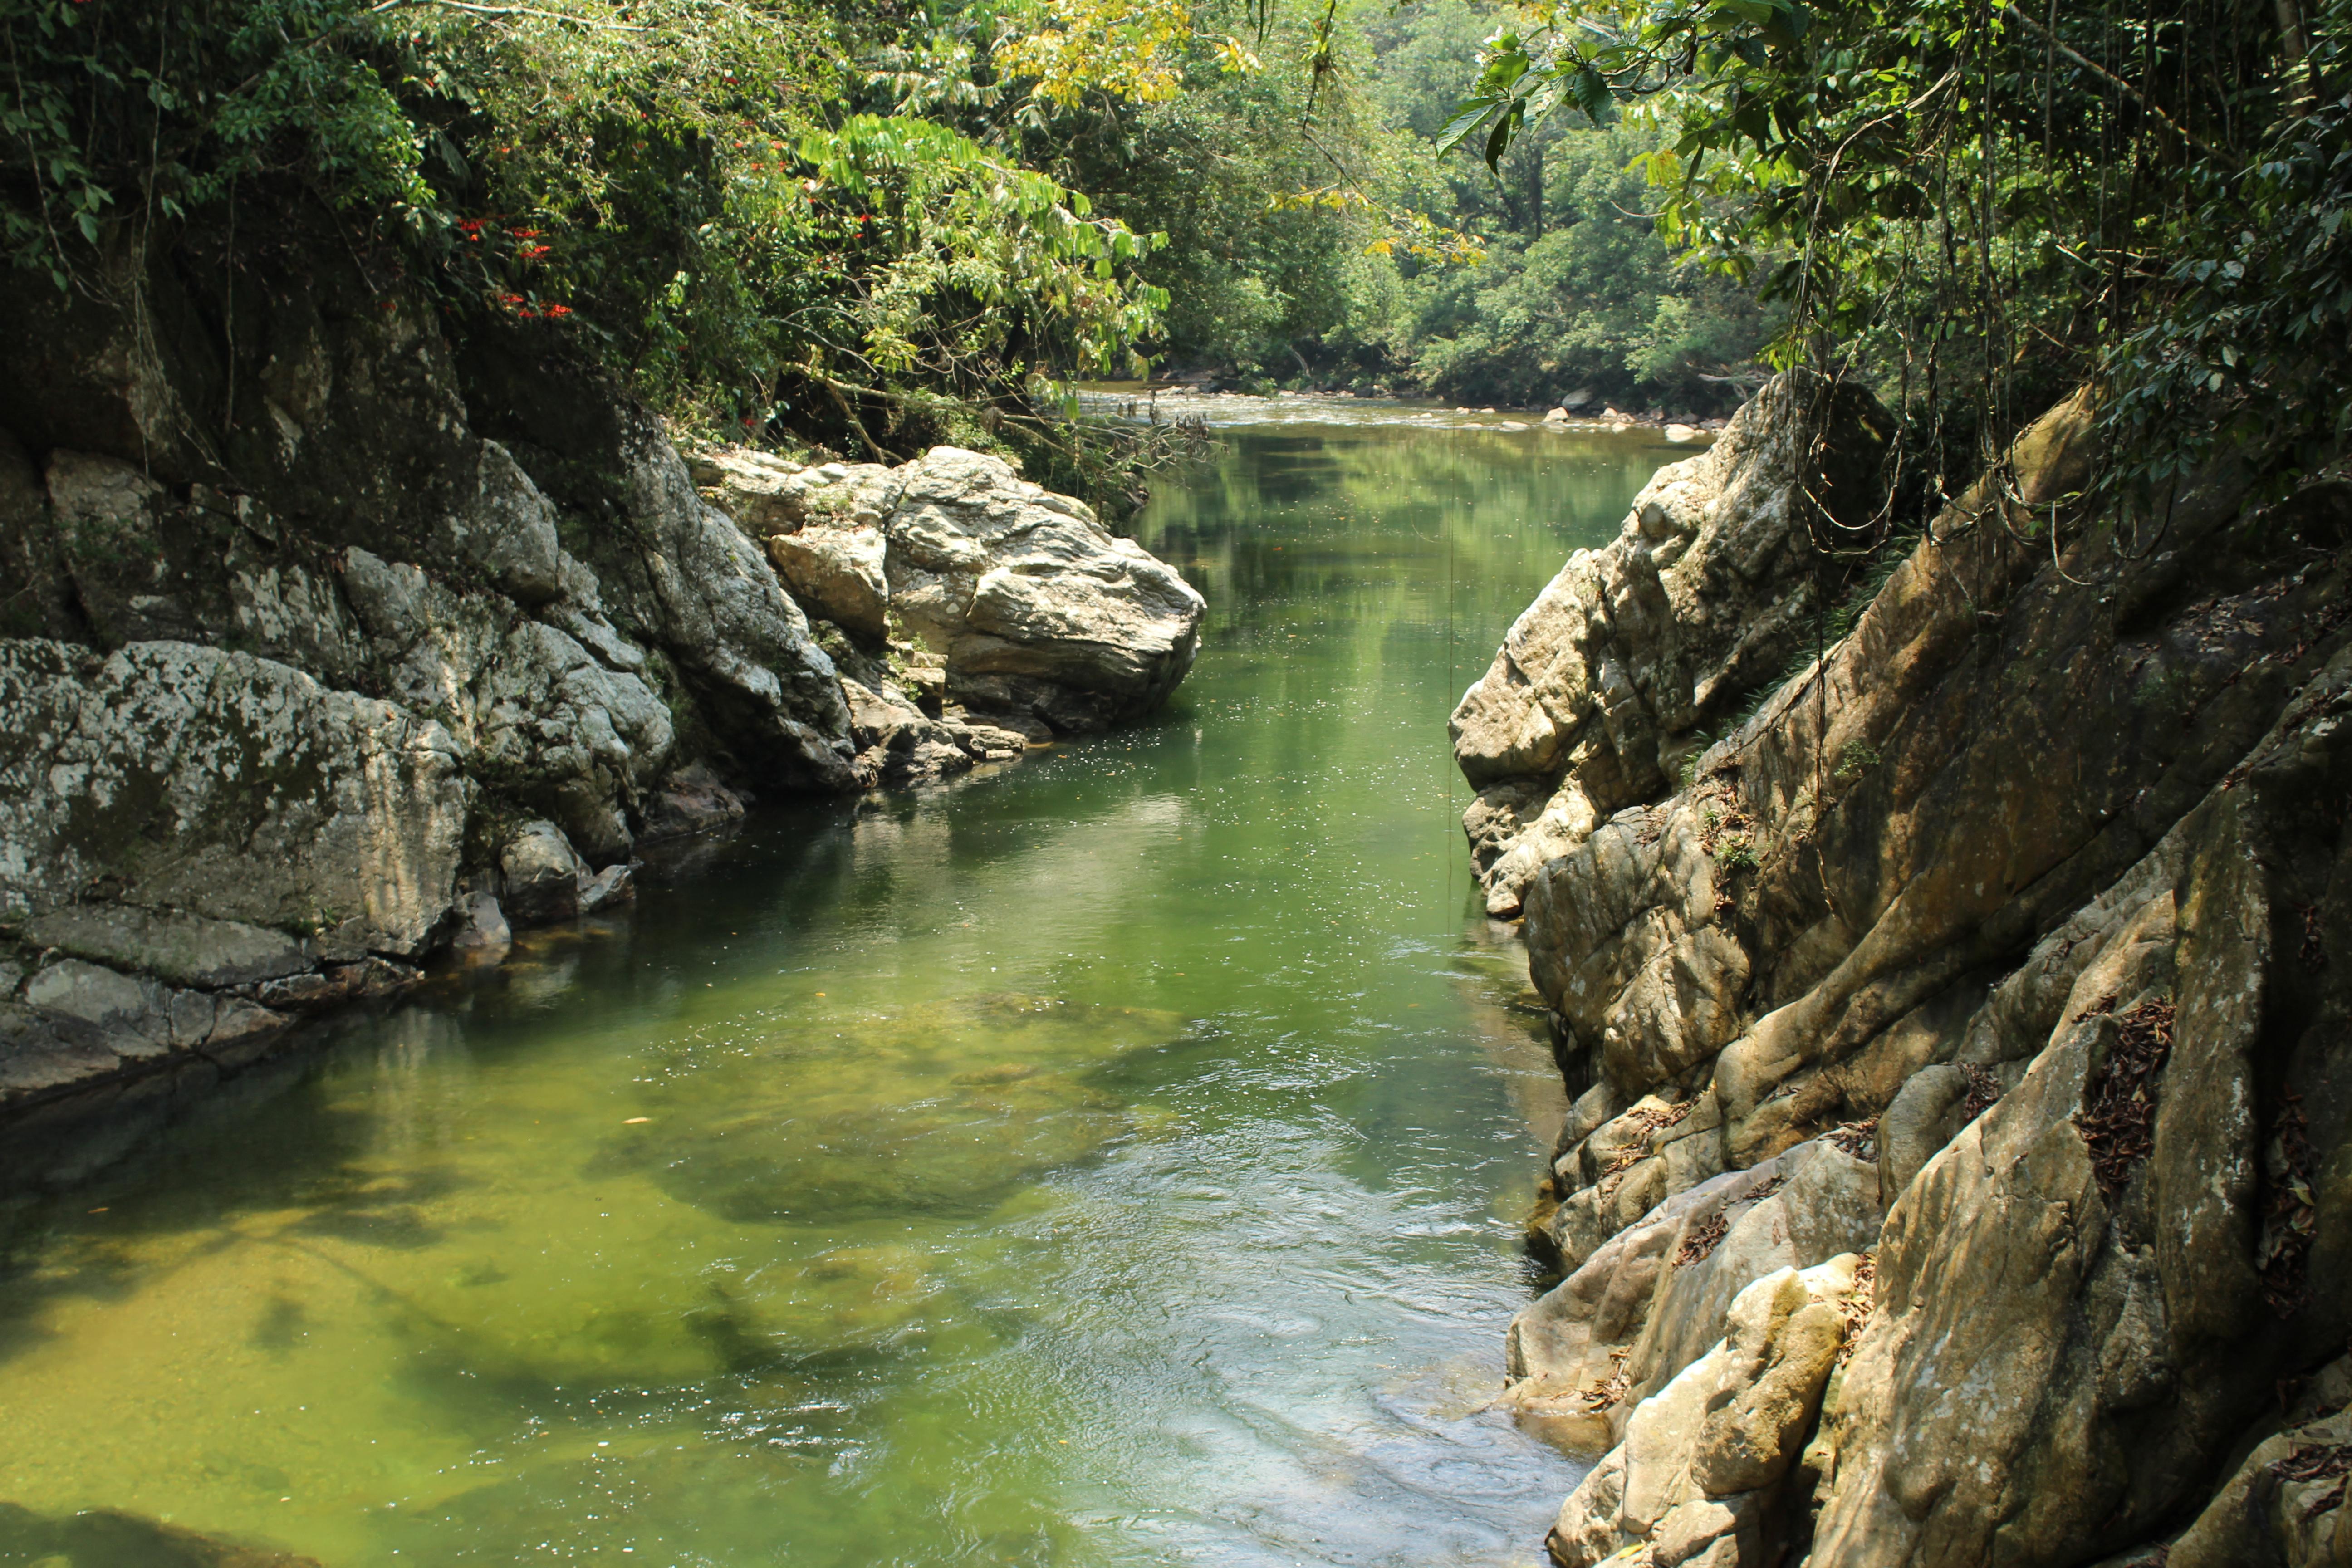 Rio Claro reserva el tigrillo